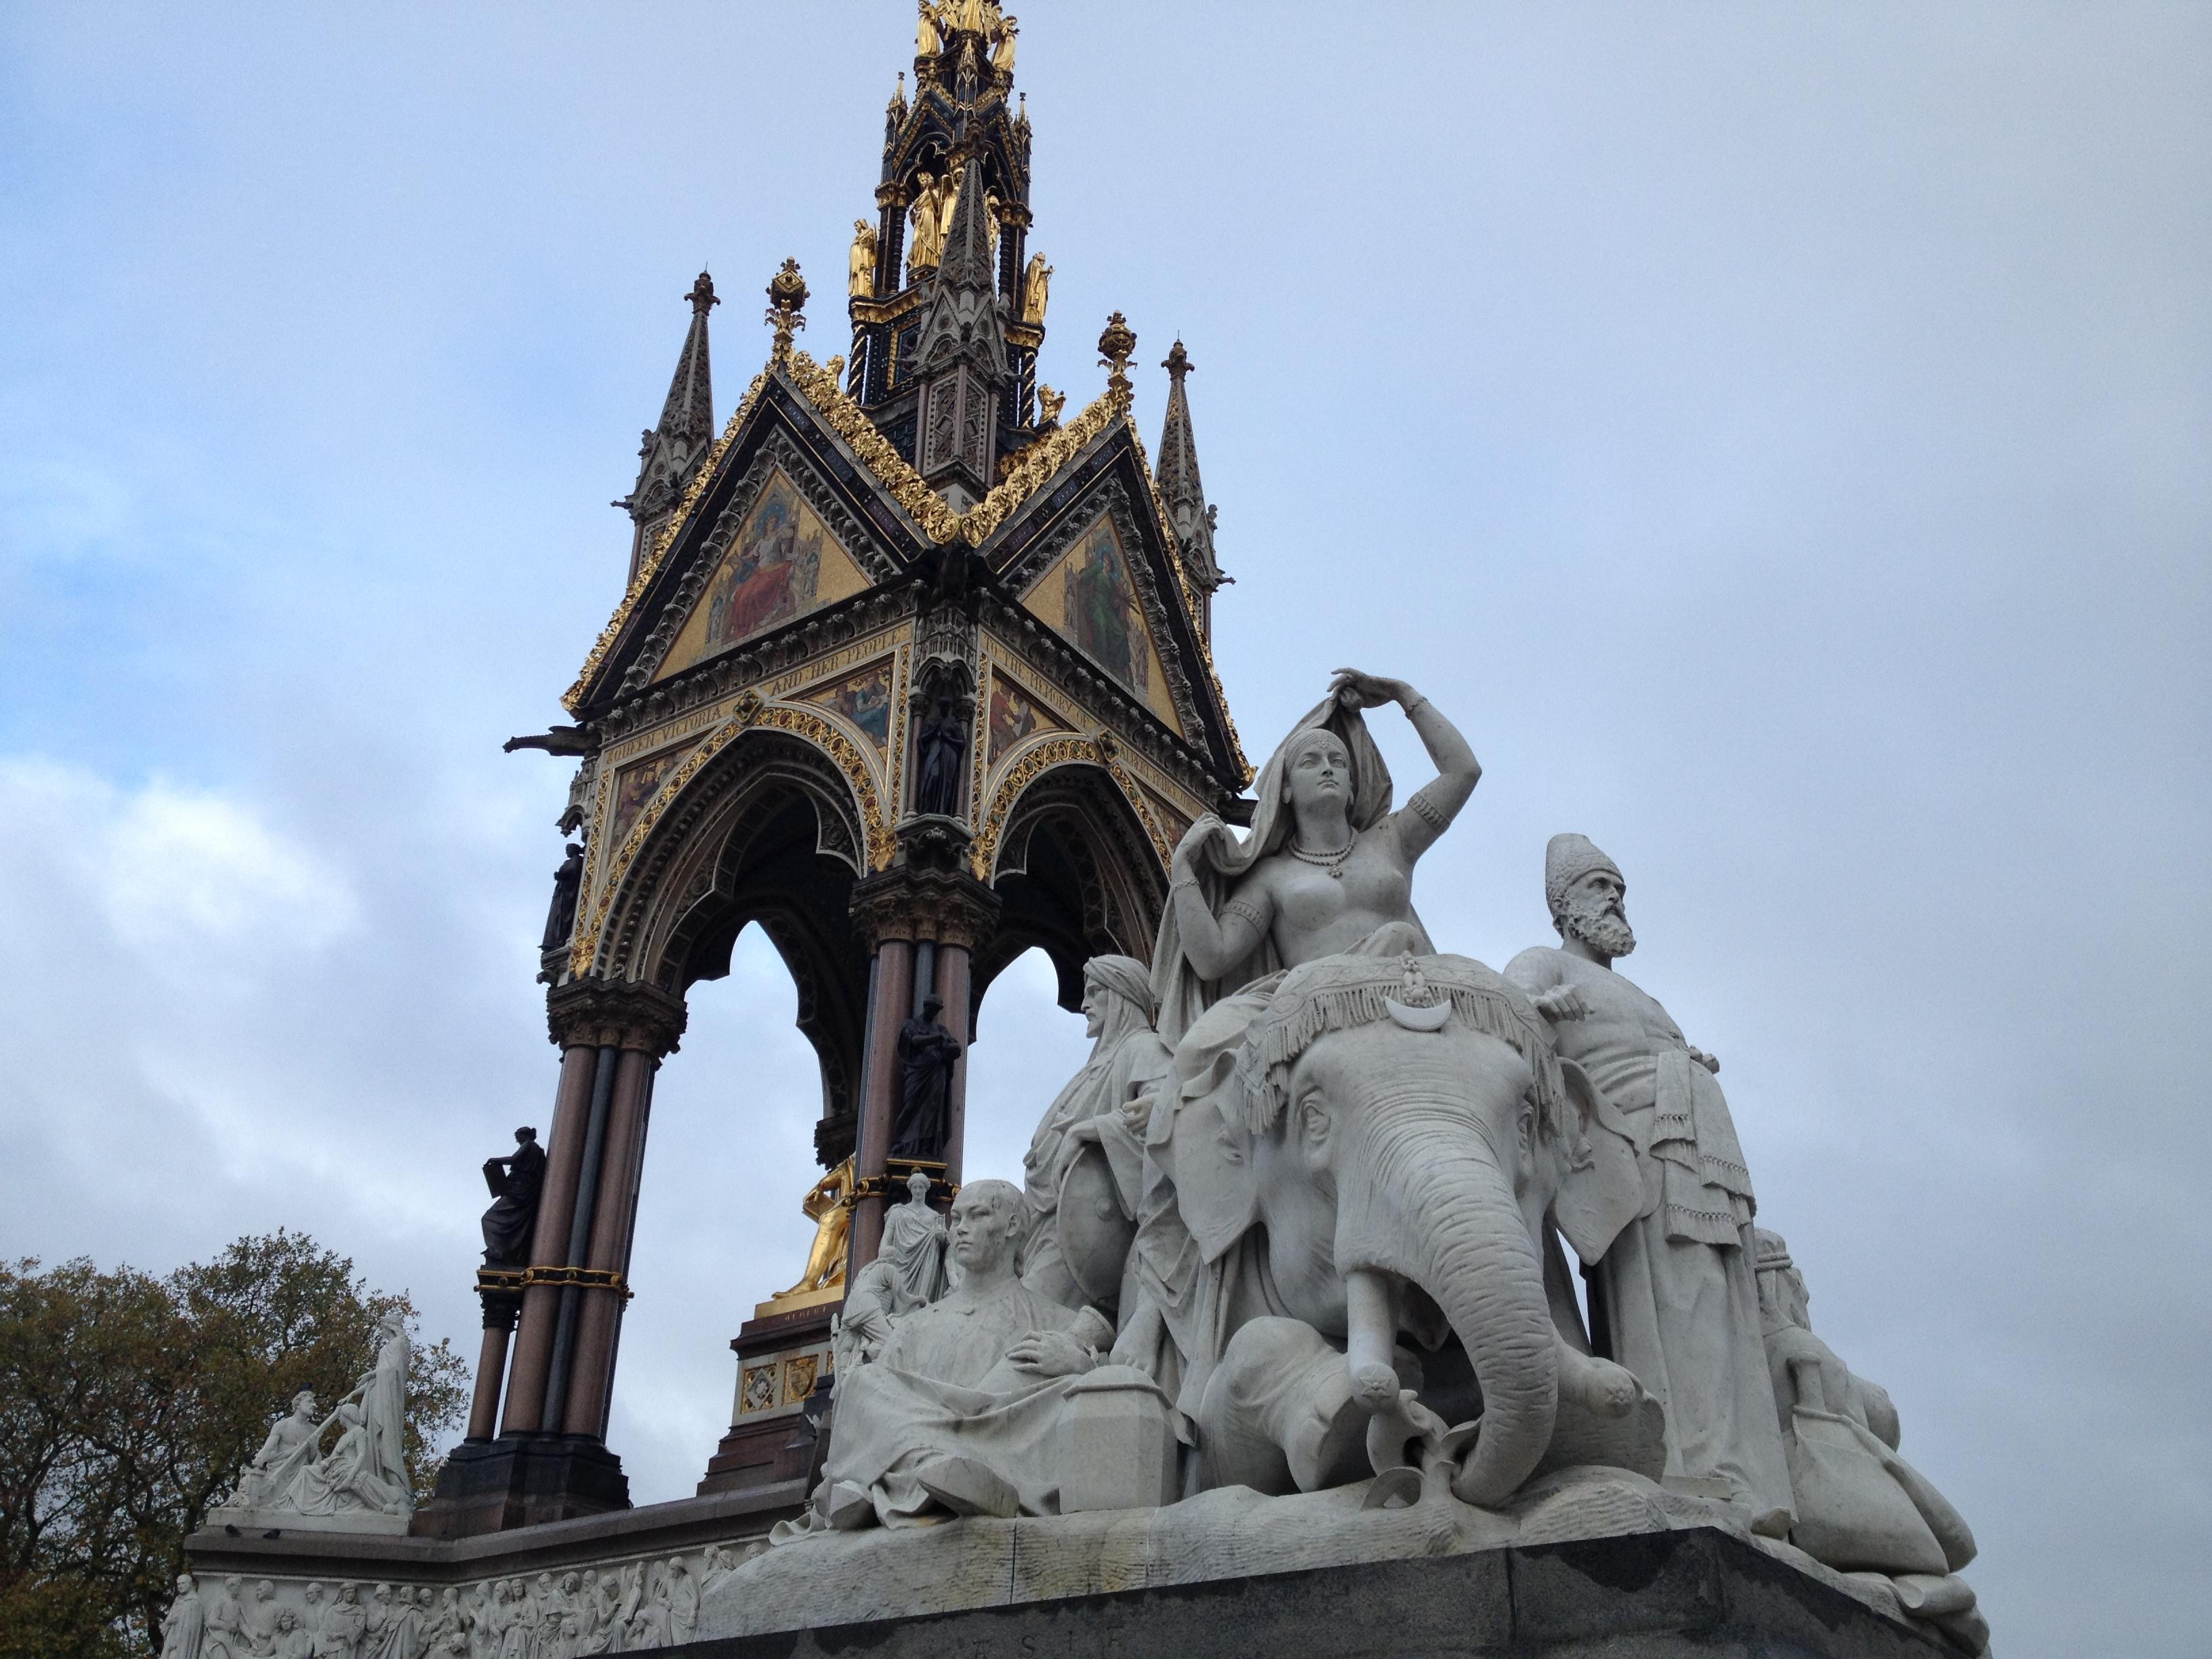 kensington gardens statues